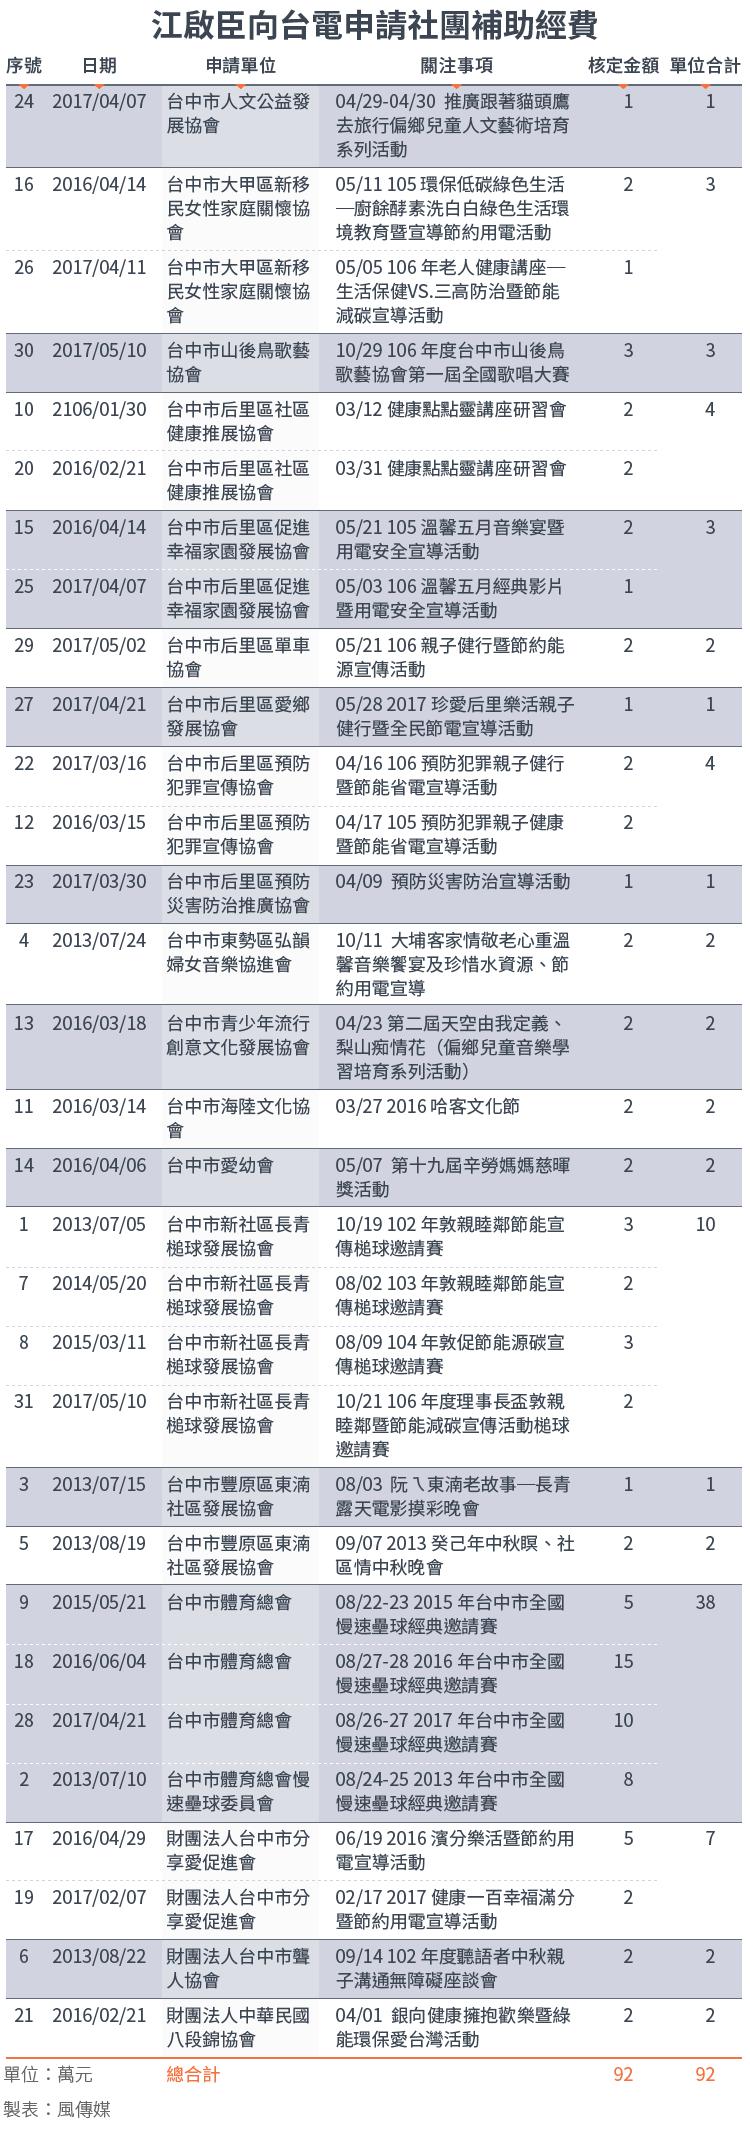 20171213-SMG0034-E02-收視費江啟臣向台電申請社團補助經費_工作區域 1.png